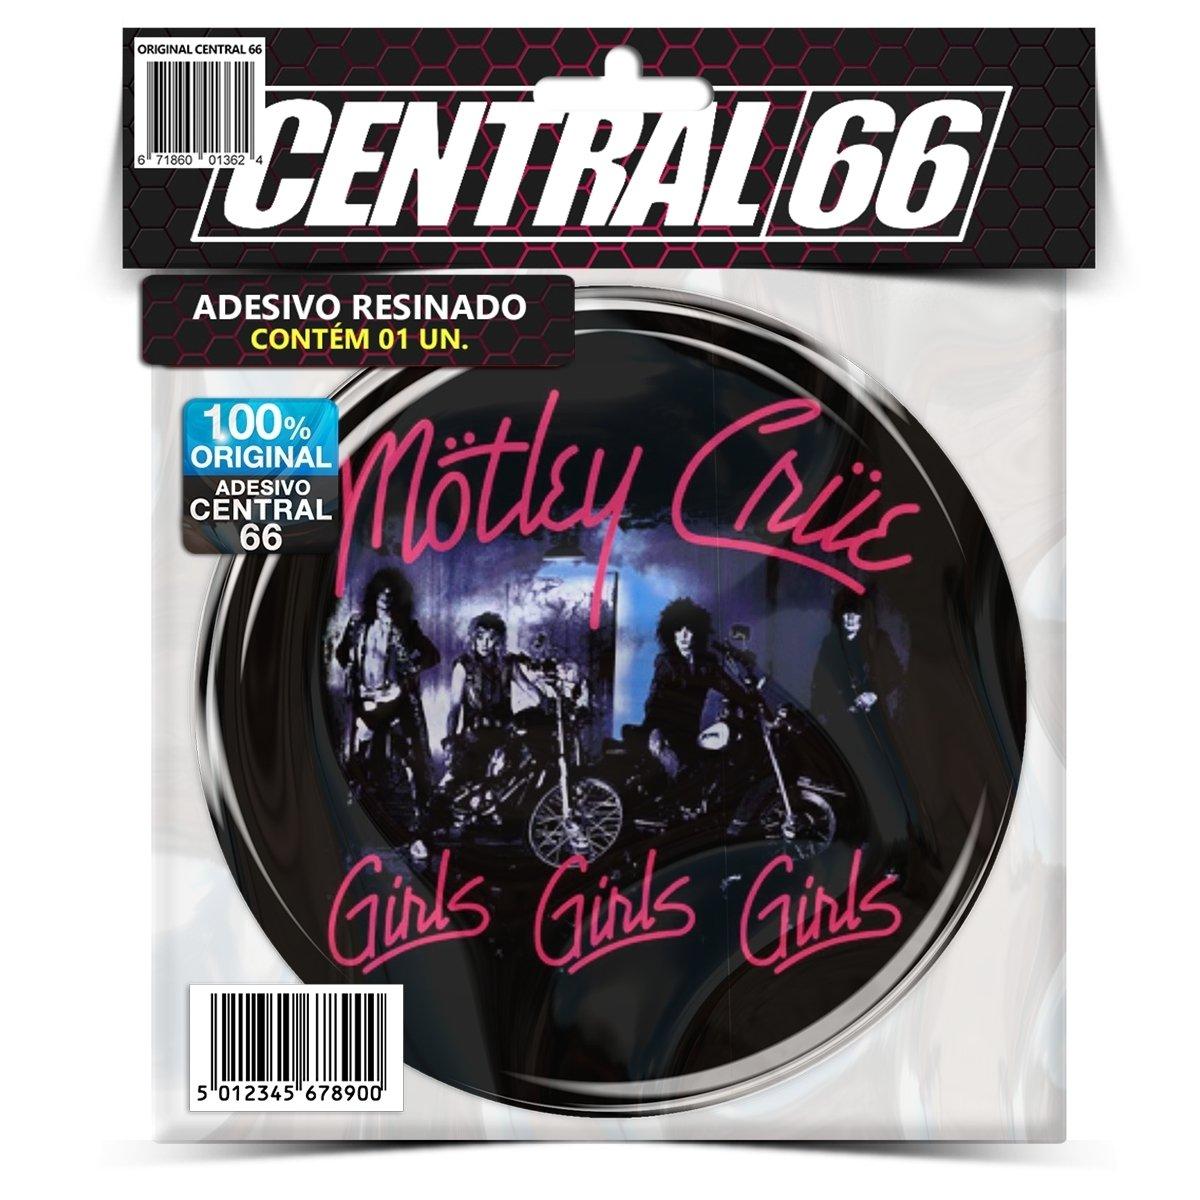 Adesivo Redondo Motley Crue Girls Girls Girls  – Central 66